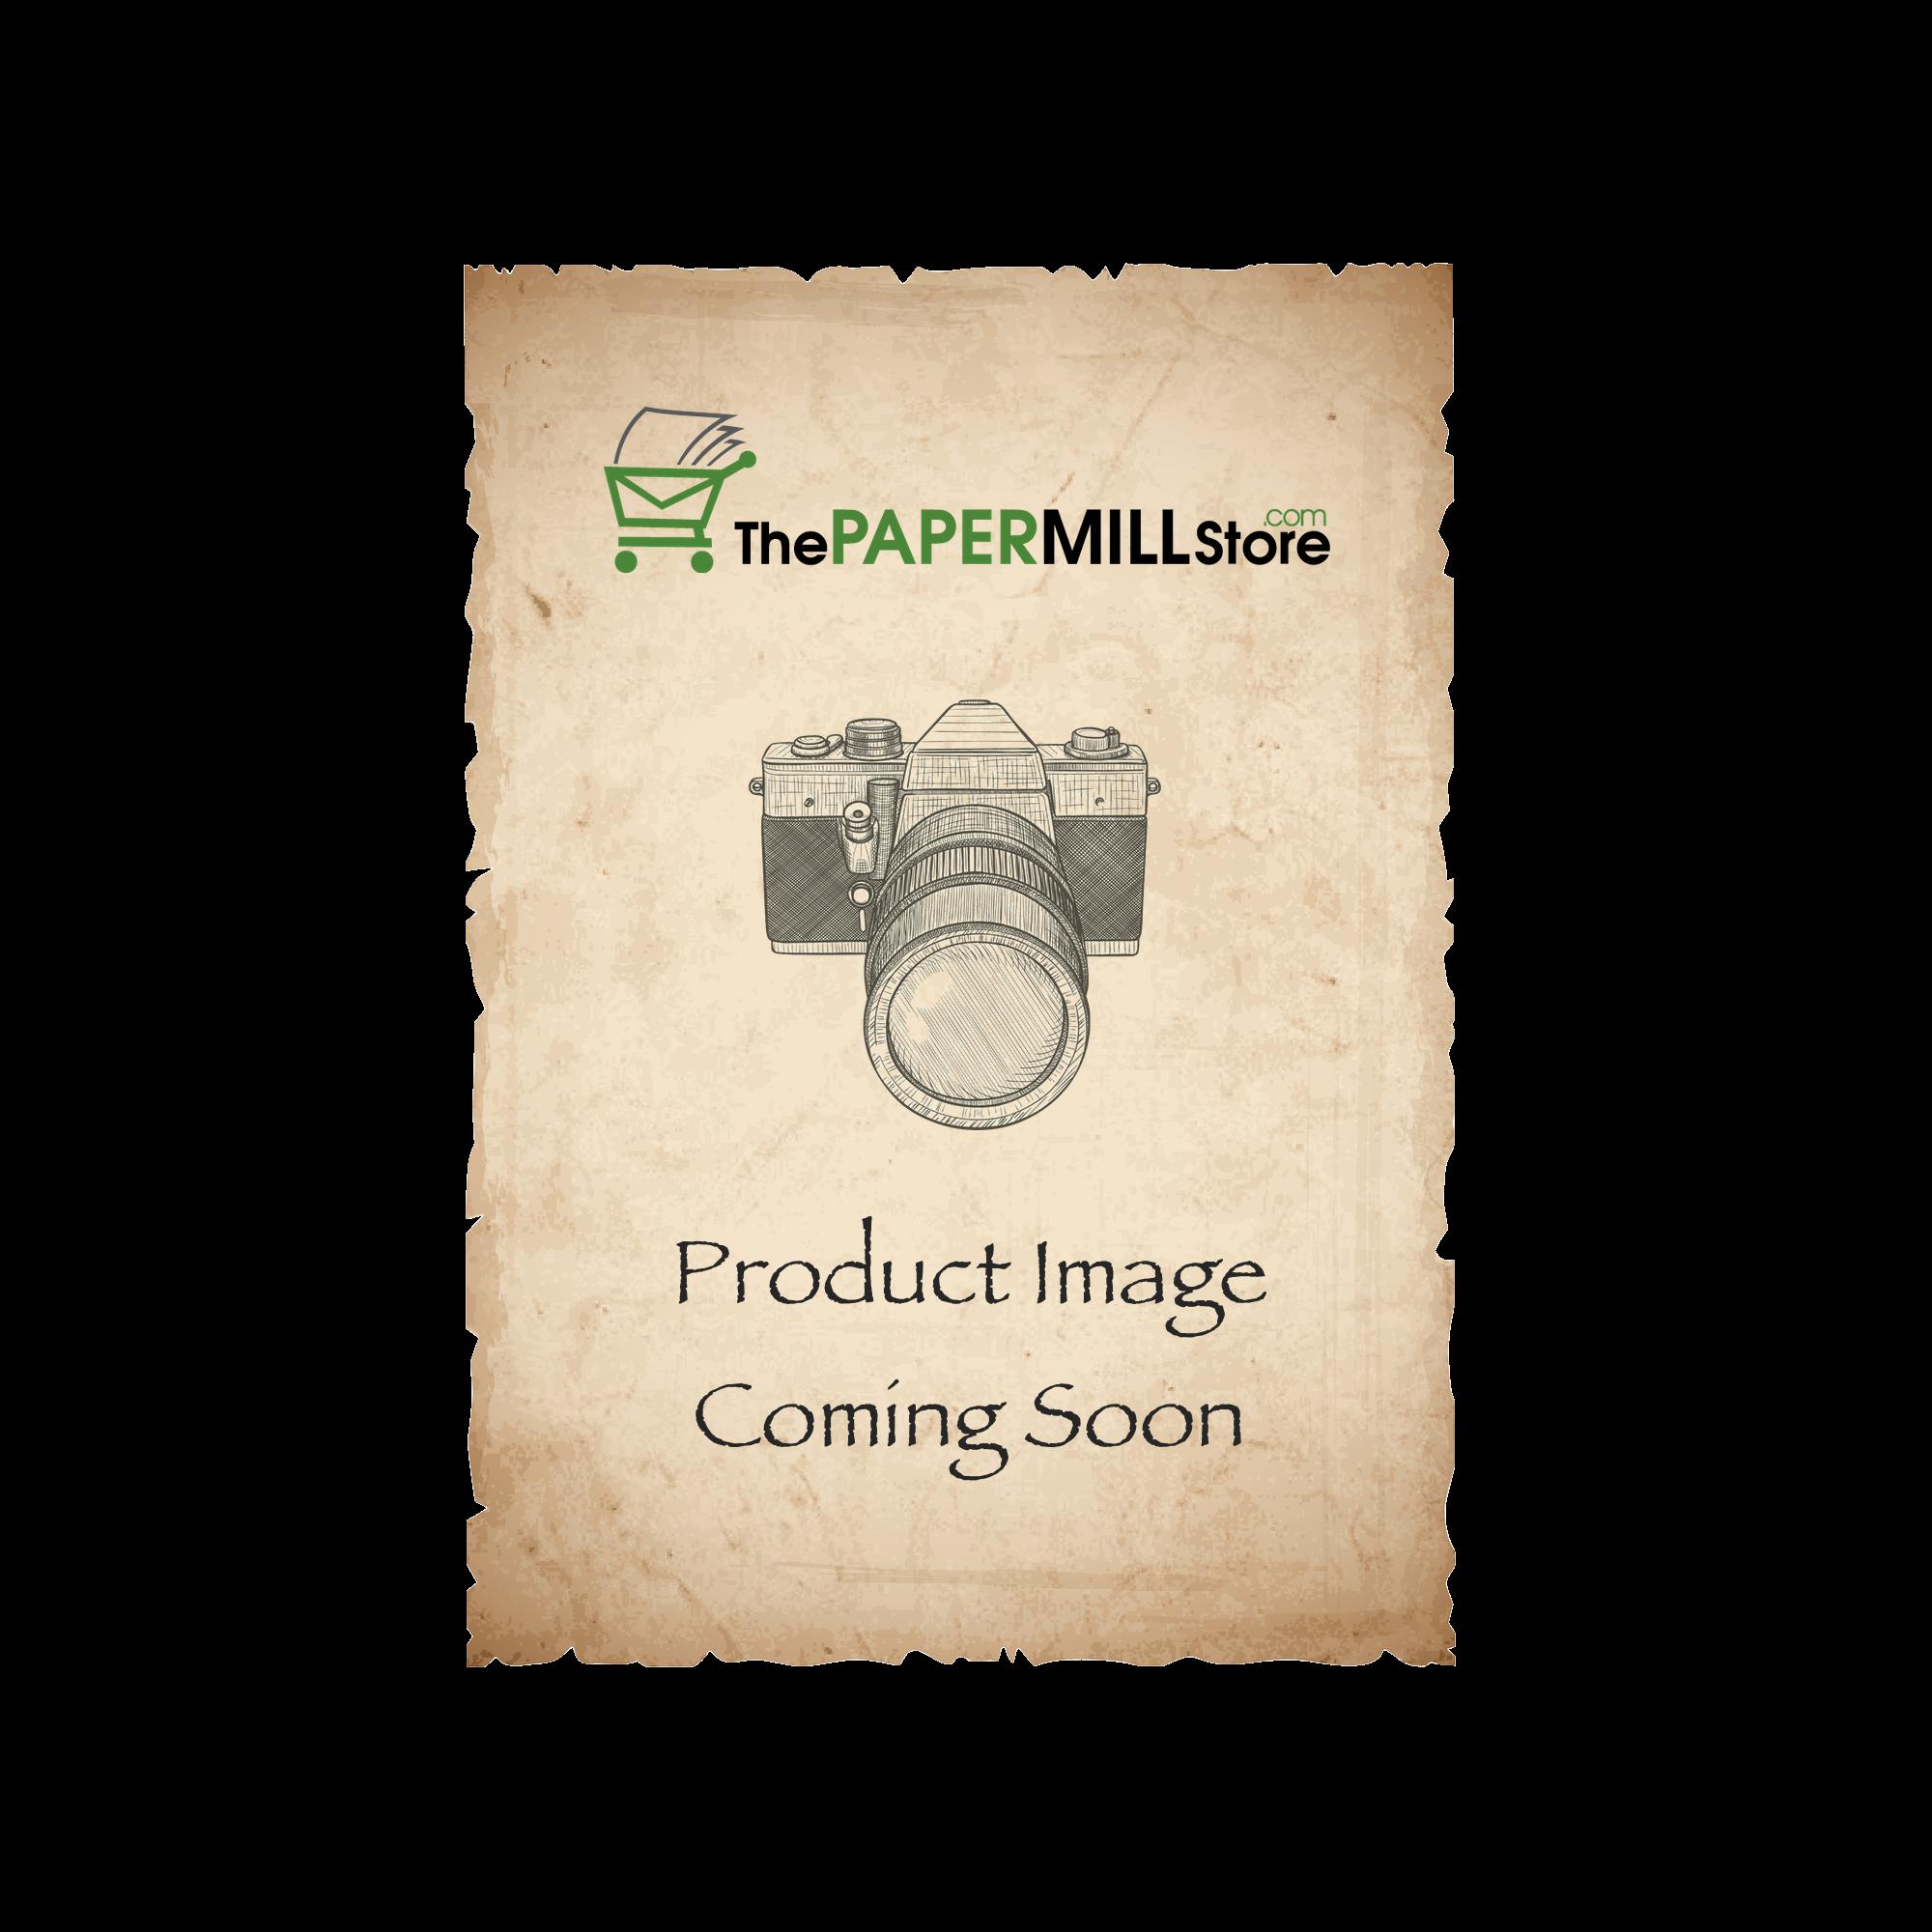 Via Linen Citron Card Stock - 8 1/2 x 11 in 80 lb Cover Linen  30% Recycled 250 per Ream